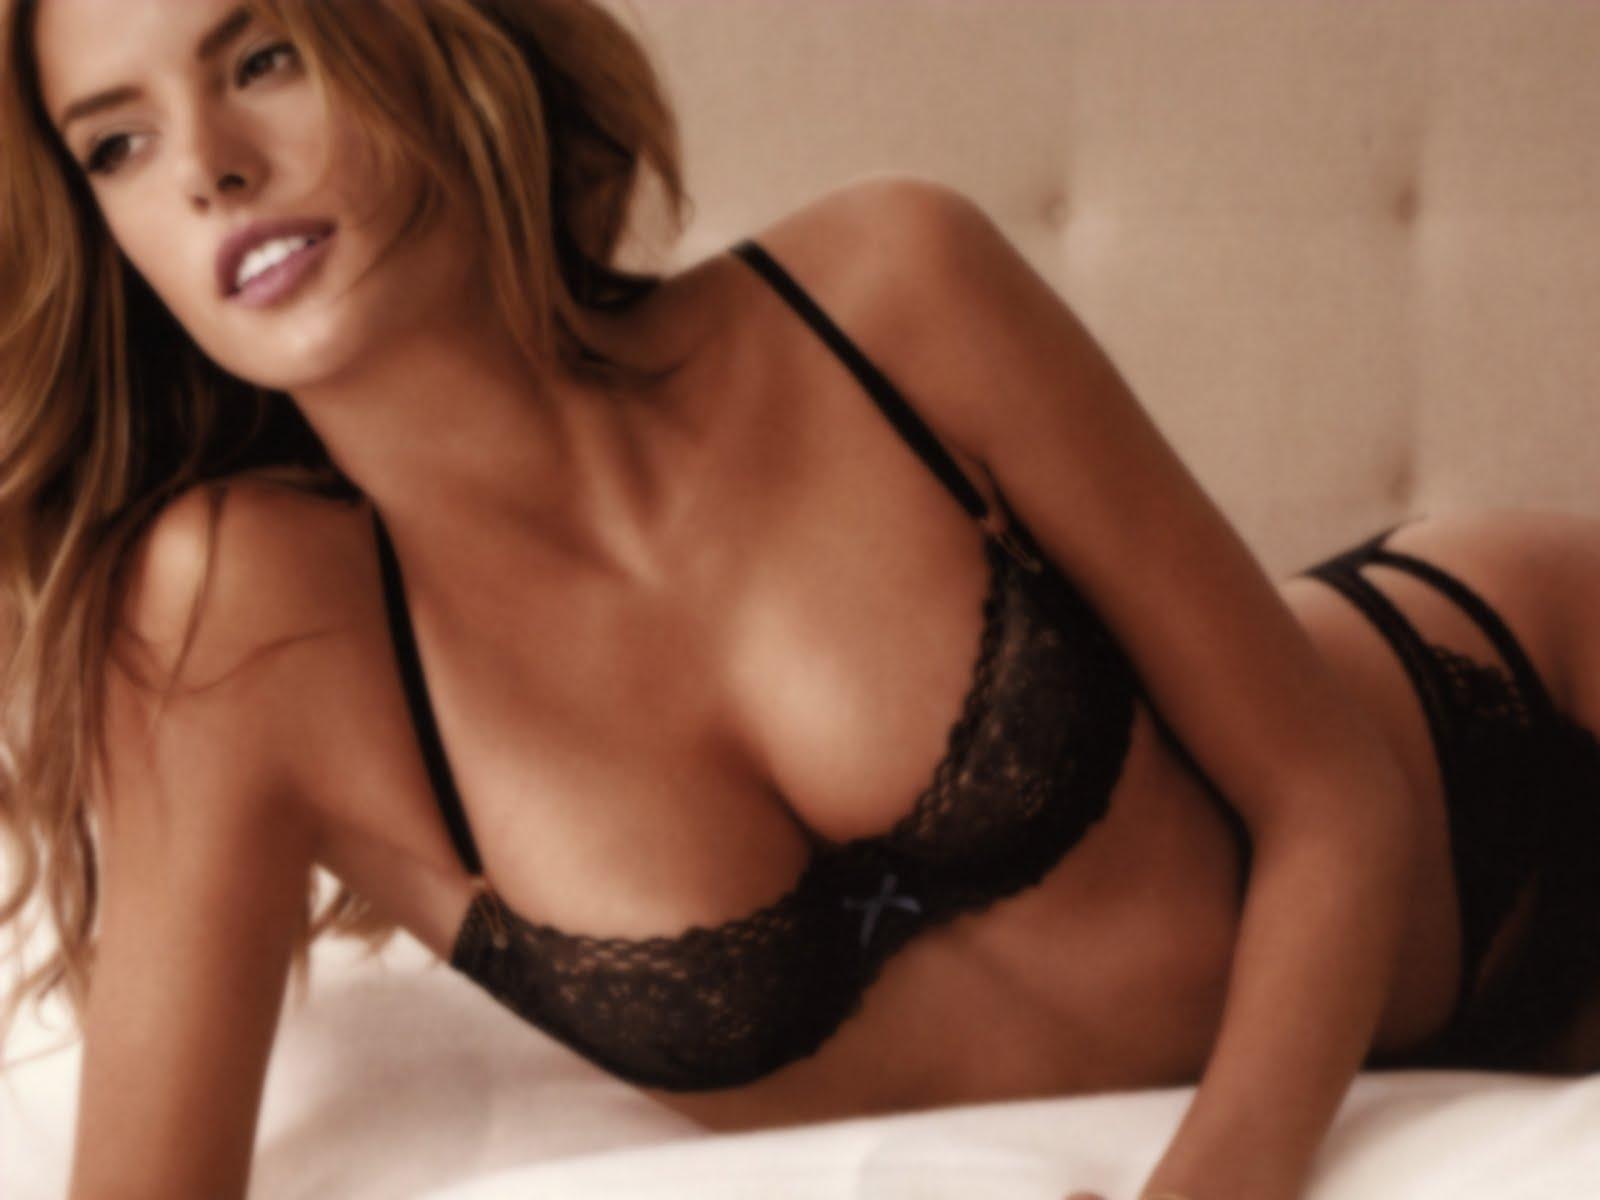 http://4.bp.blogspot.com/-7Nc_mLtwet4/TclwAZCXsII/AAAAAAAAADc/ndiz6RYN0f8/s1600/Alessandra%2BAmbrosio%2BNude%2Bsexy%2BPictures%252C%2BAlessandra%2BAmbrosio%2BNaked%2Bsexy%2BClips-Sexy-Model-Wallpaper-Alessandra-Ambrosio.jpg